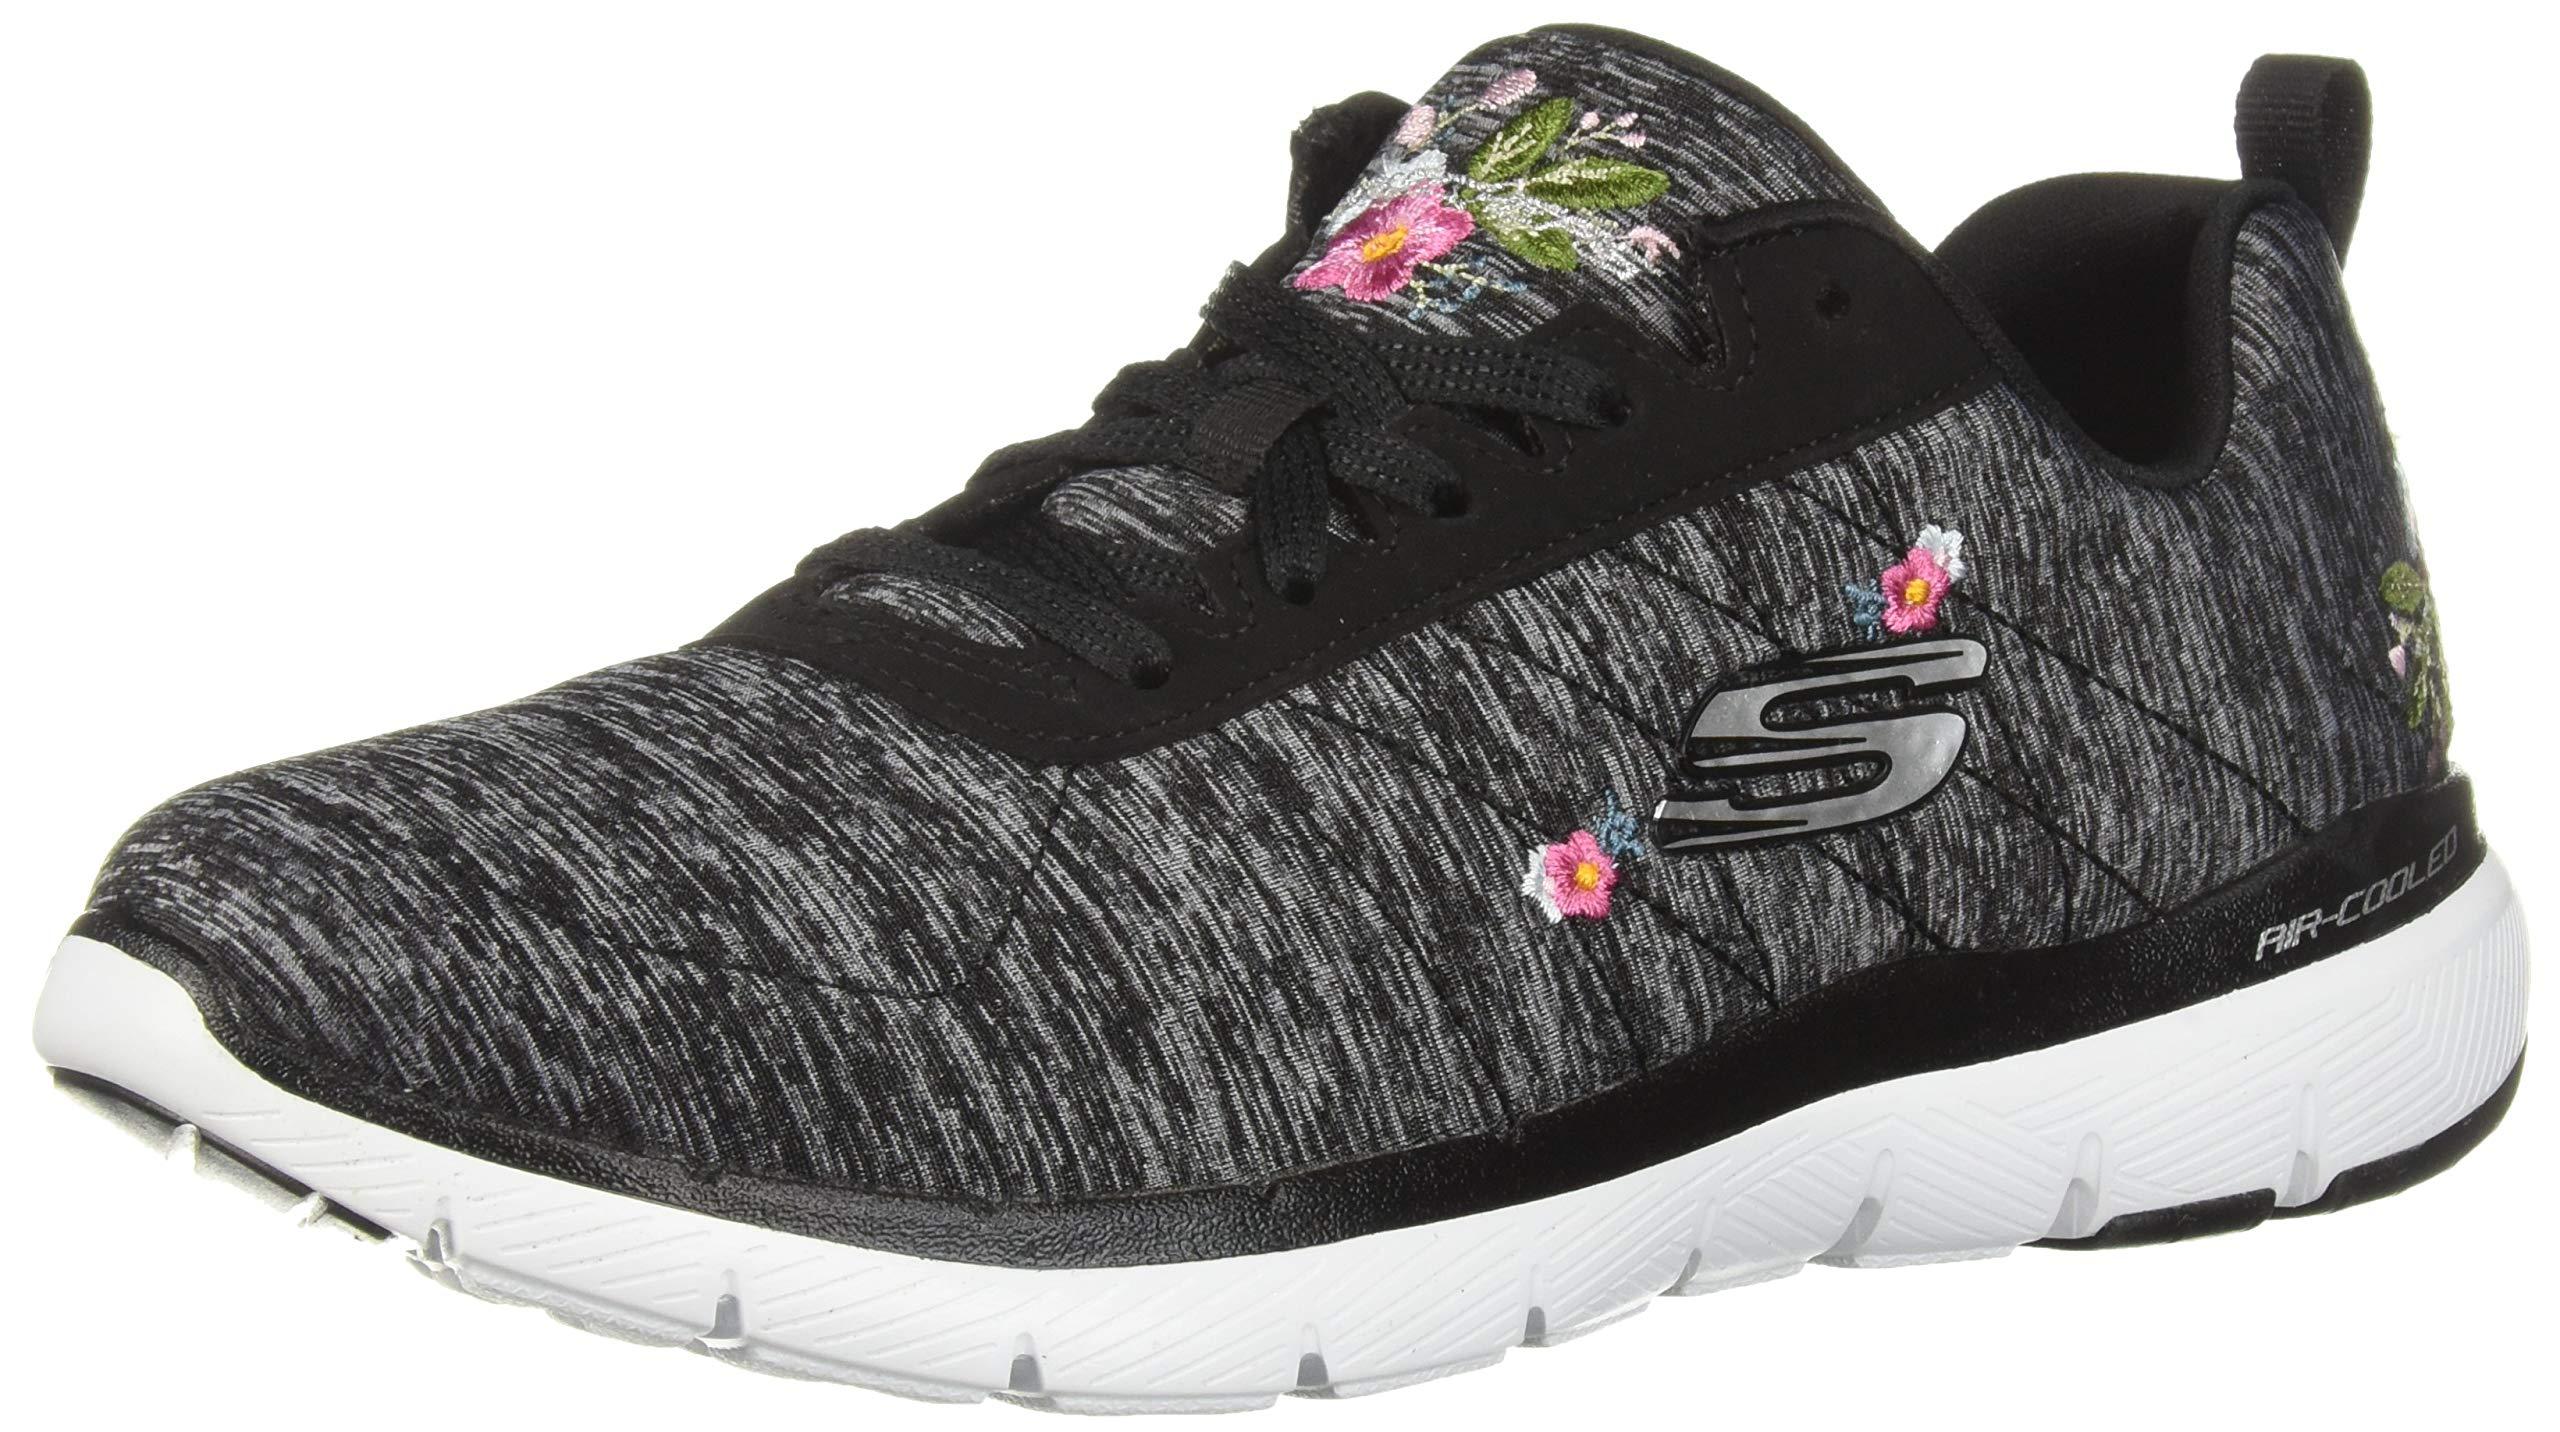 Skechers Flex Appeal 3.0 in Blossom